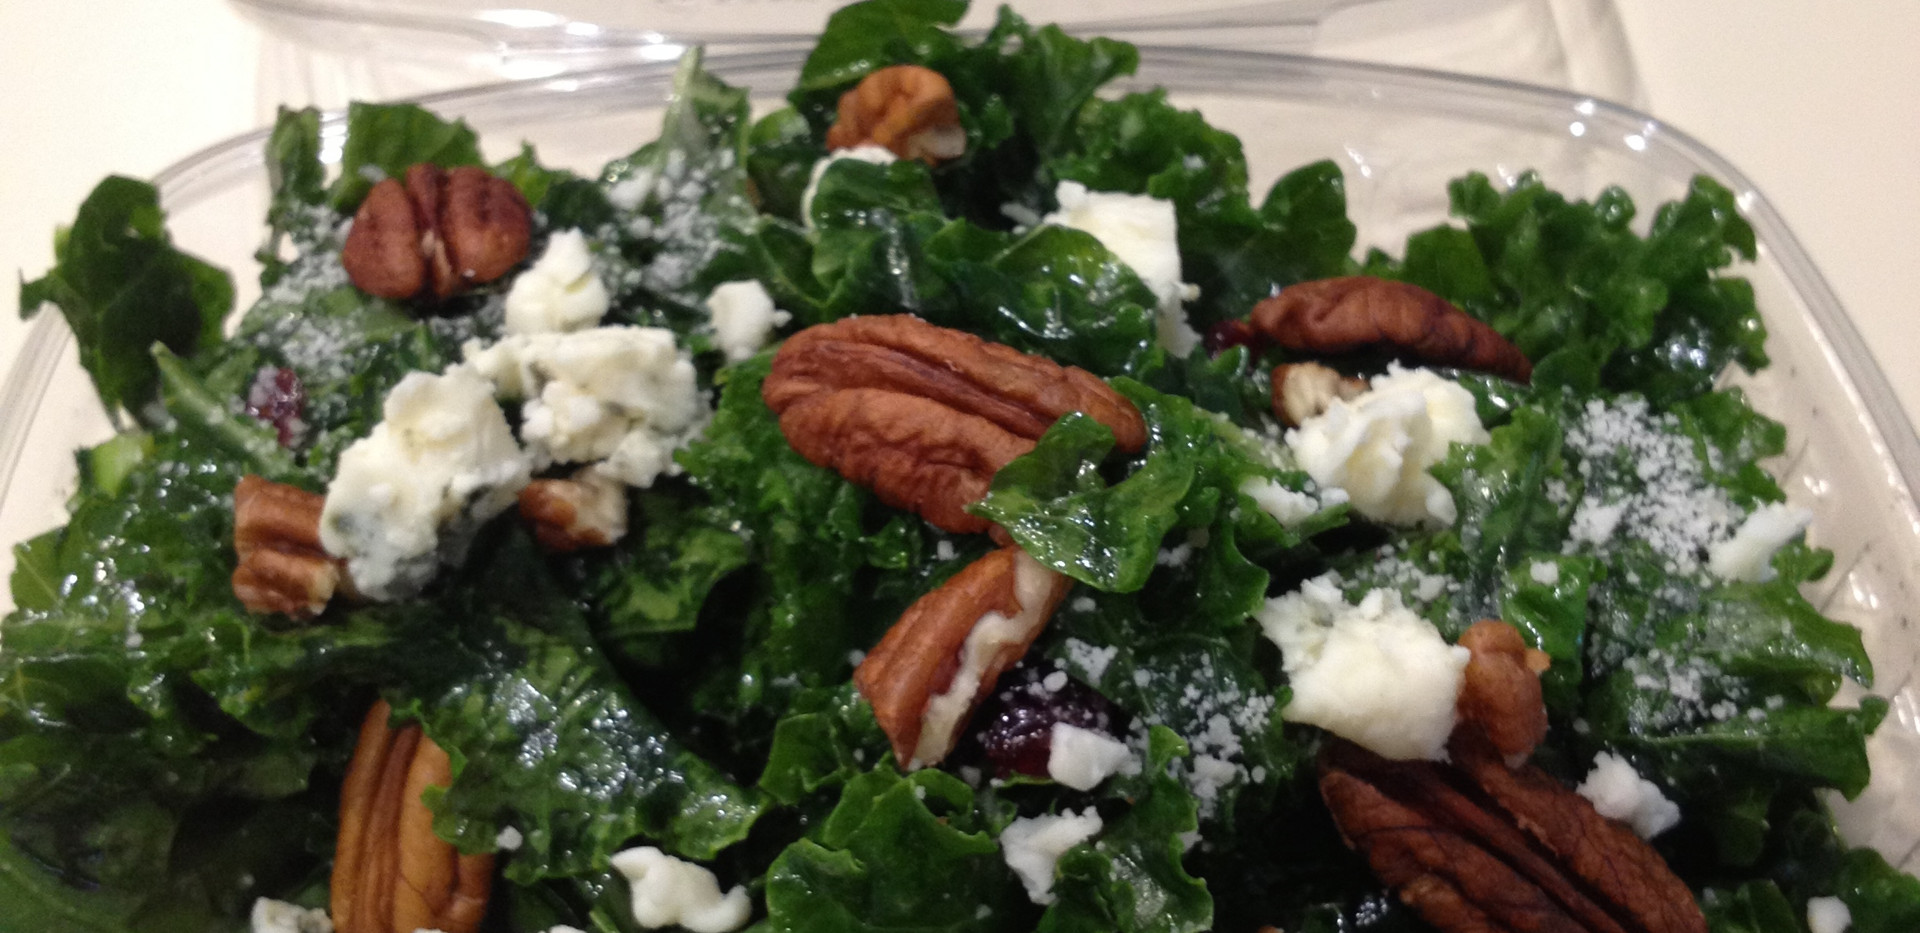 Honey Lemon Kale Salad w/ Bleu Cheese